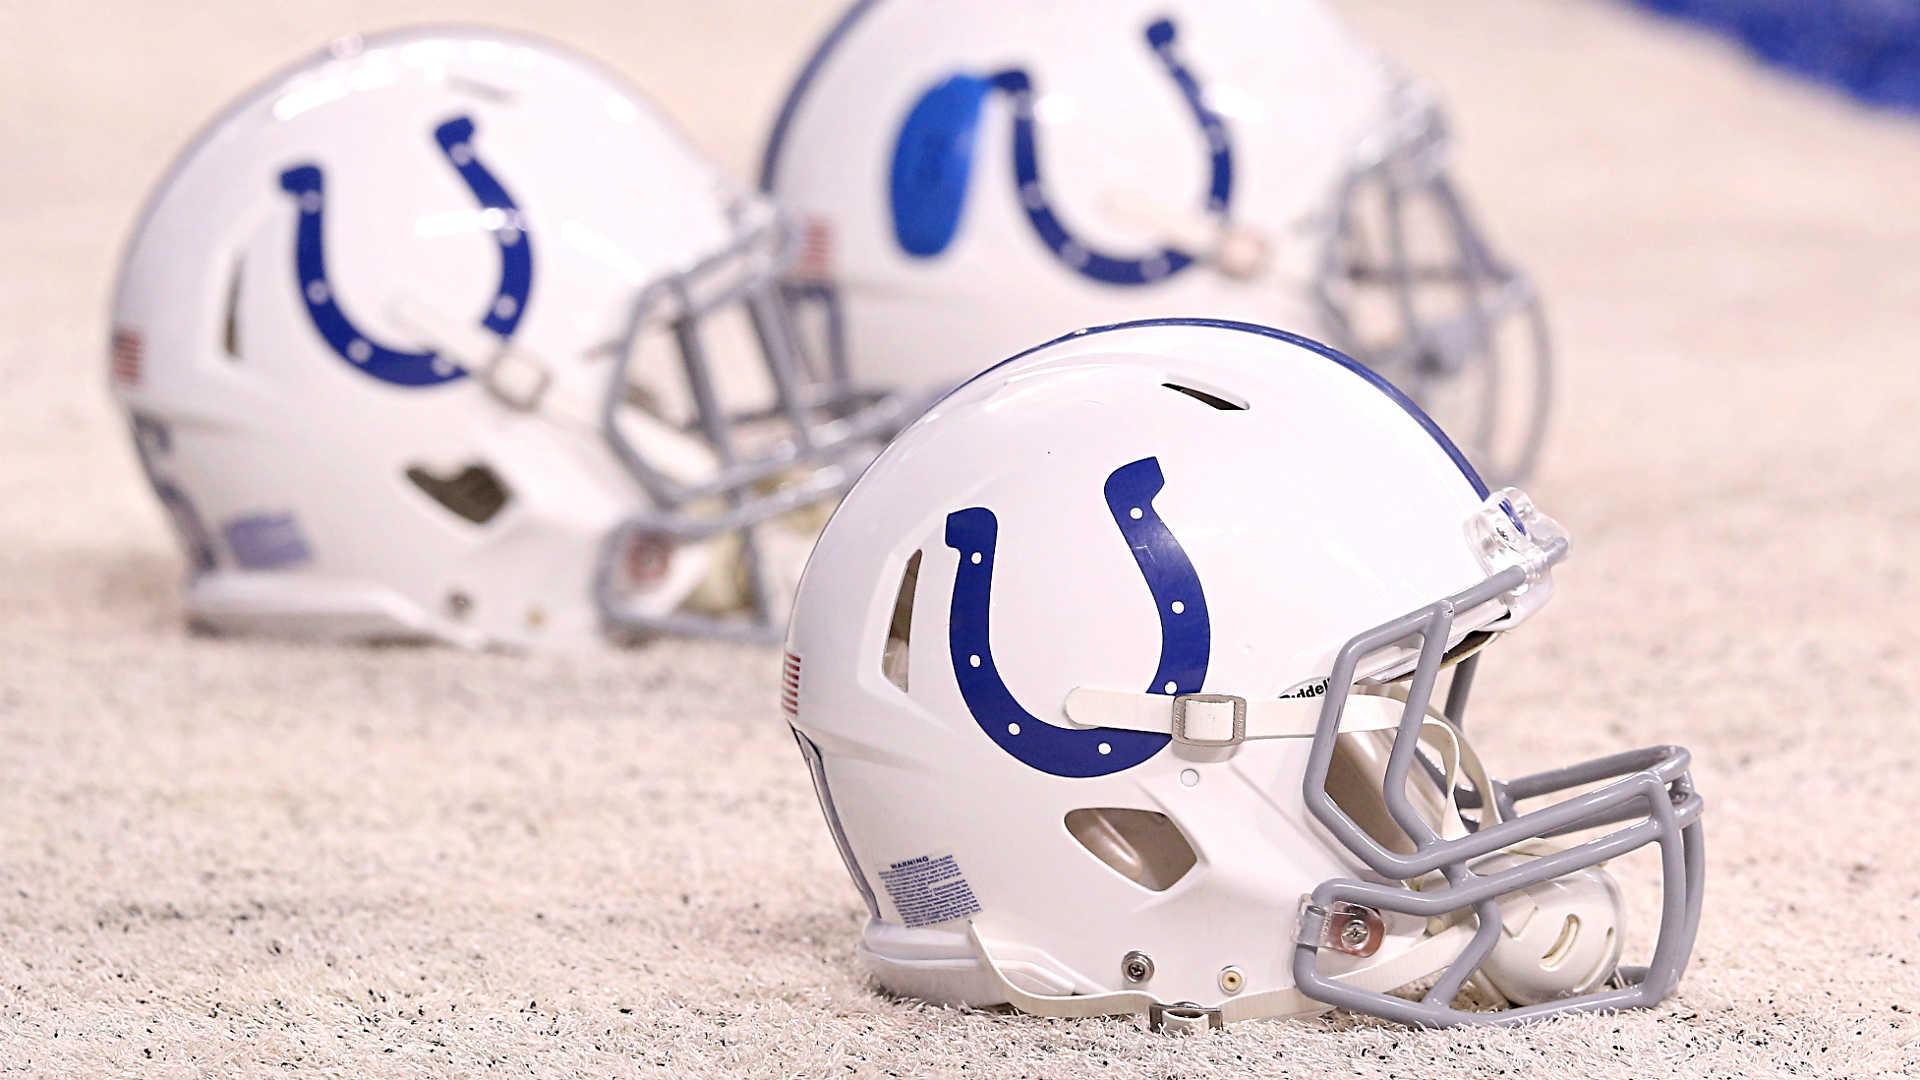 Colts-helmets-022218-getty-ftrjpg_18i0sd630jaf716tqvakb6i29v